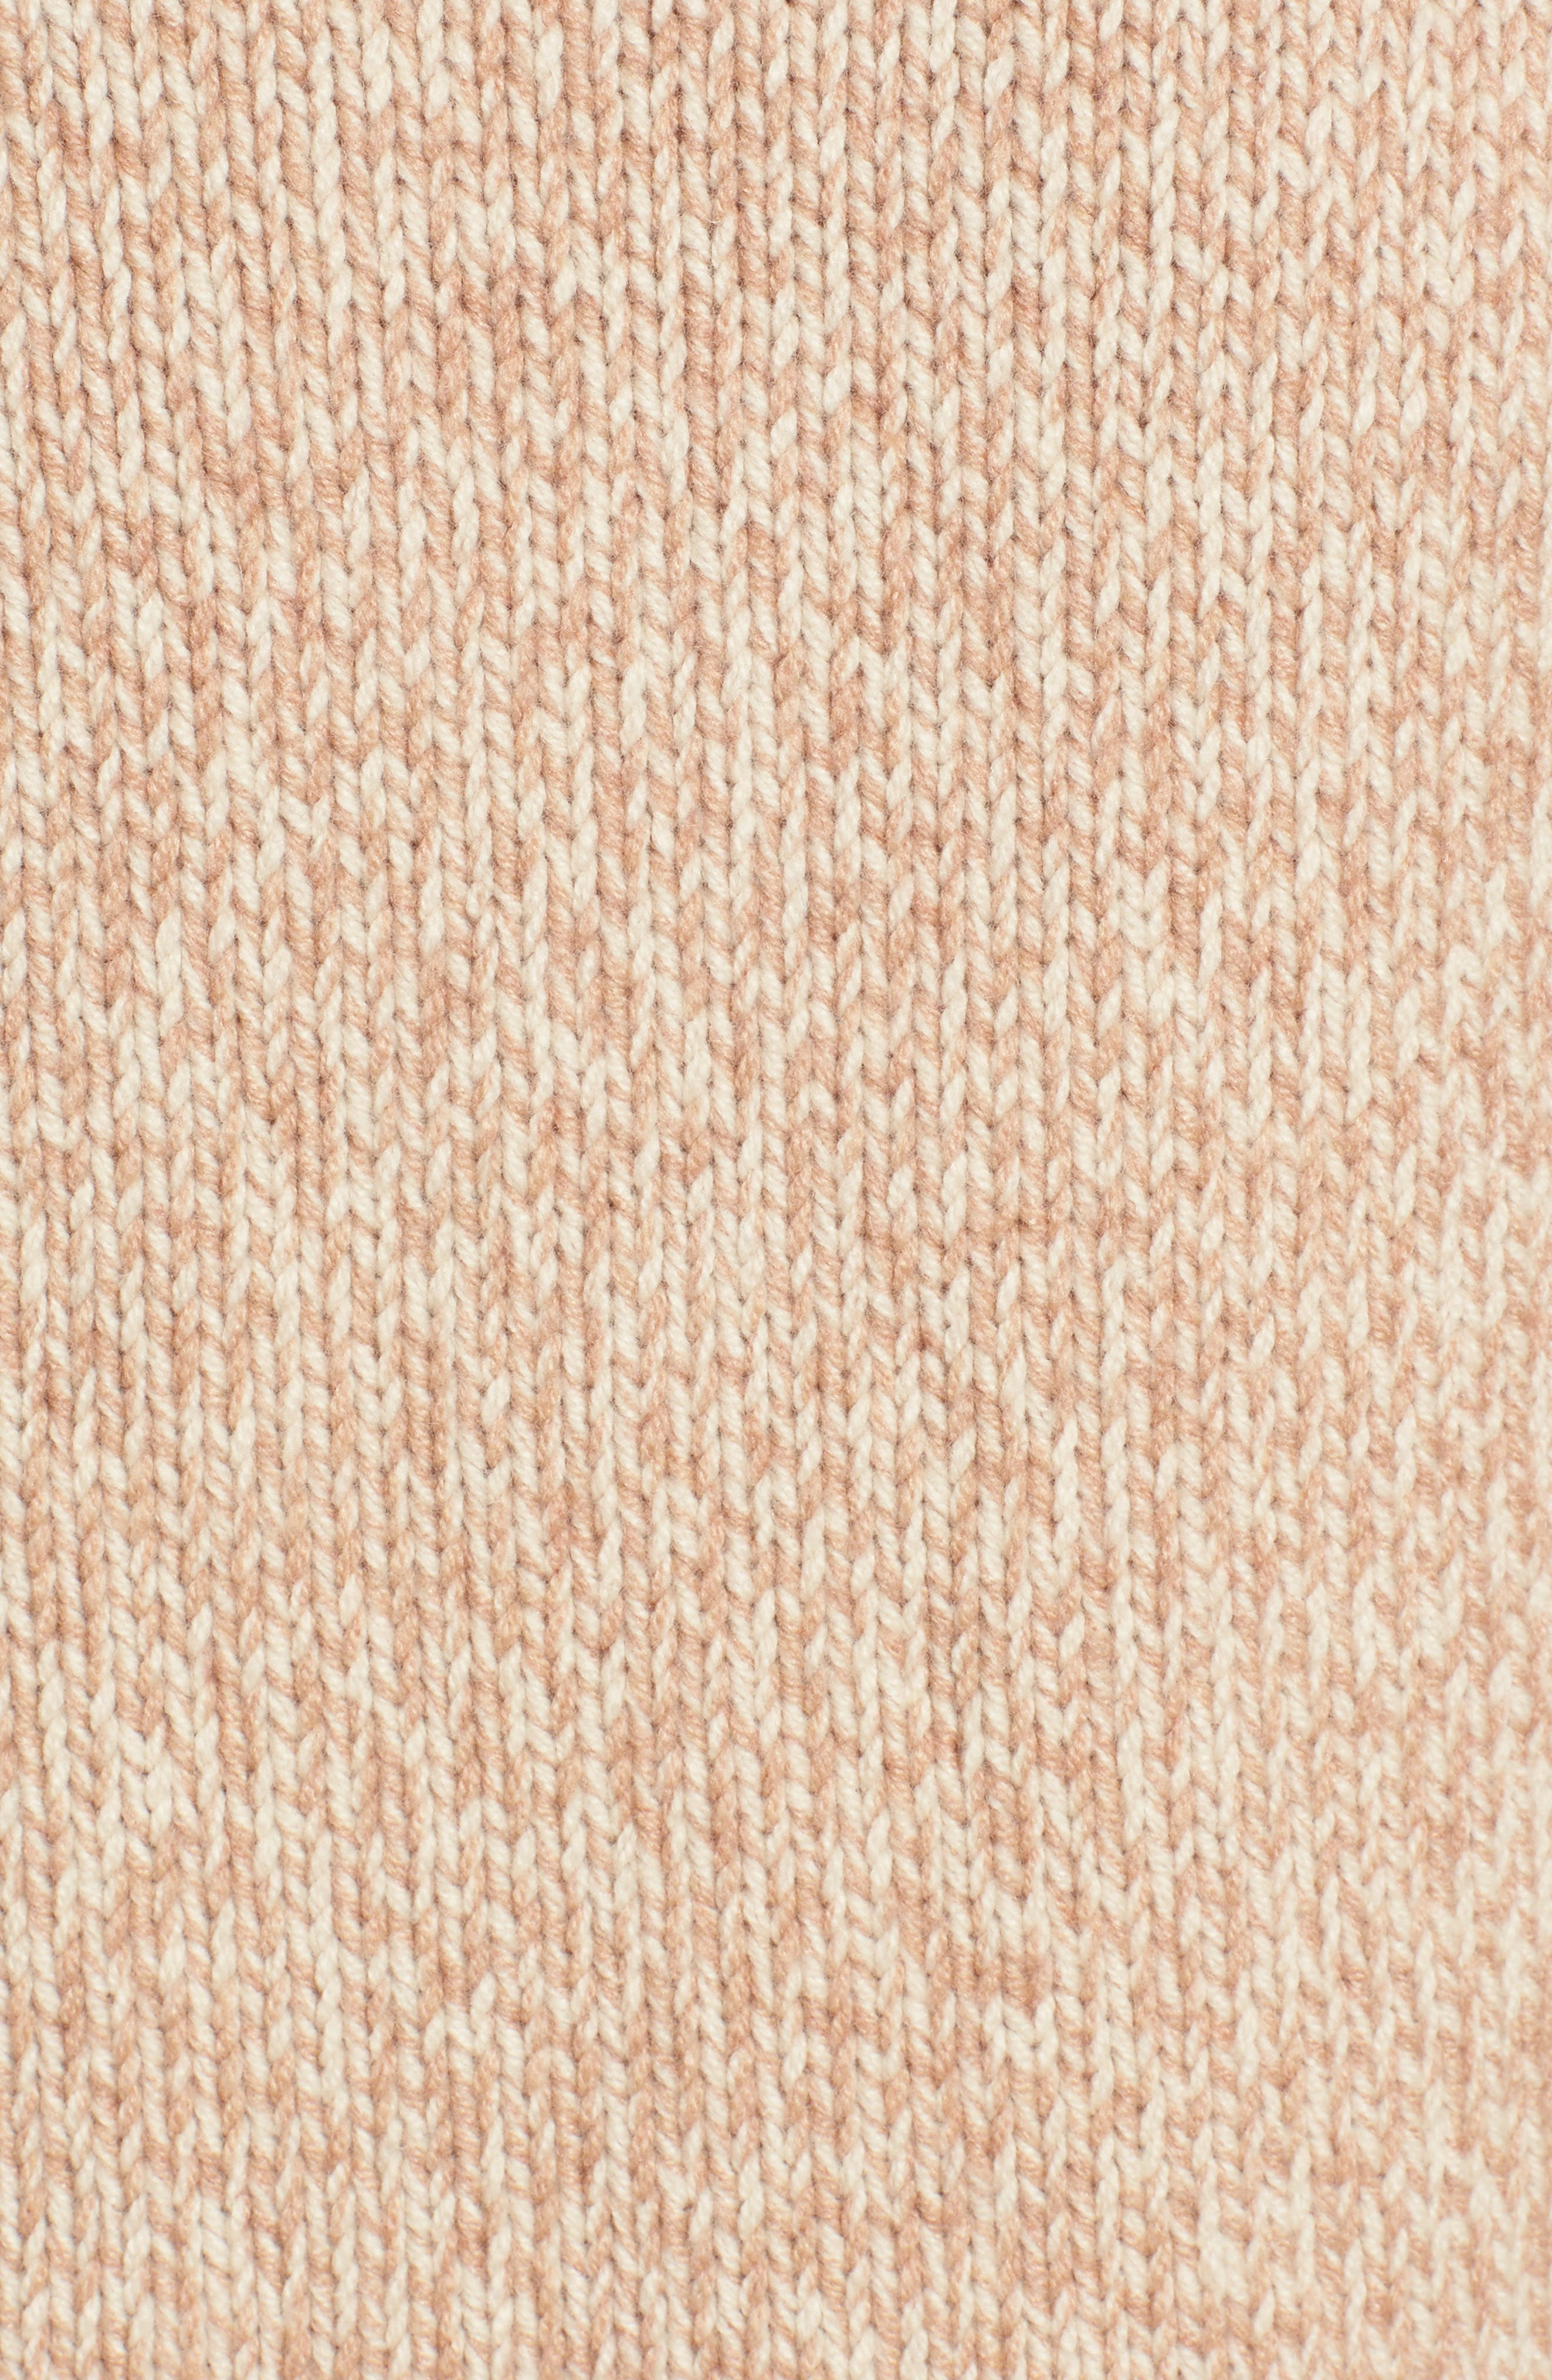 Marled Sleeveless Turtleneck Sweater,                             Alternate thumbnail 5, color,                             Marled Voile